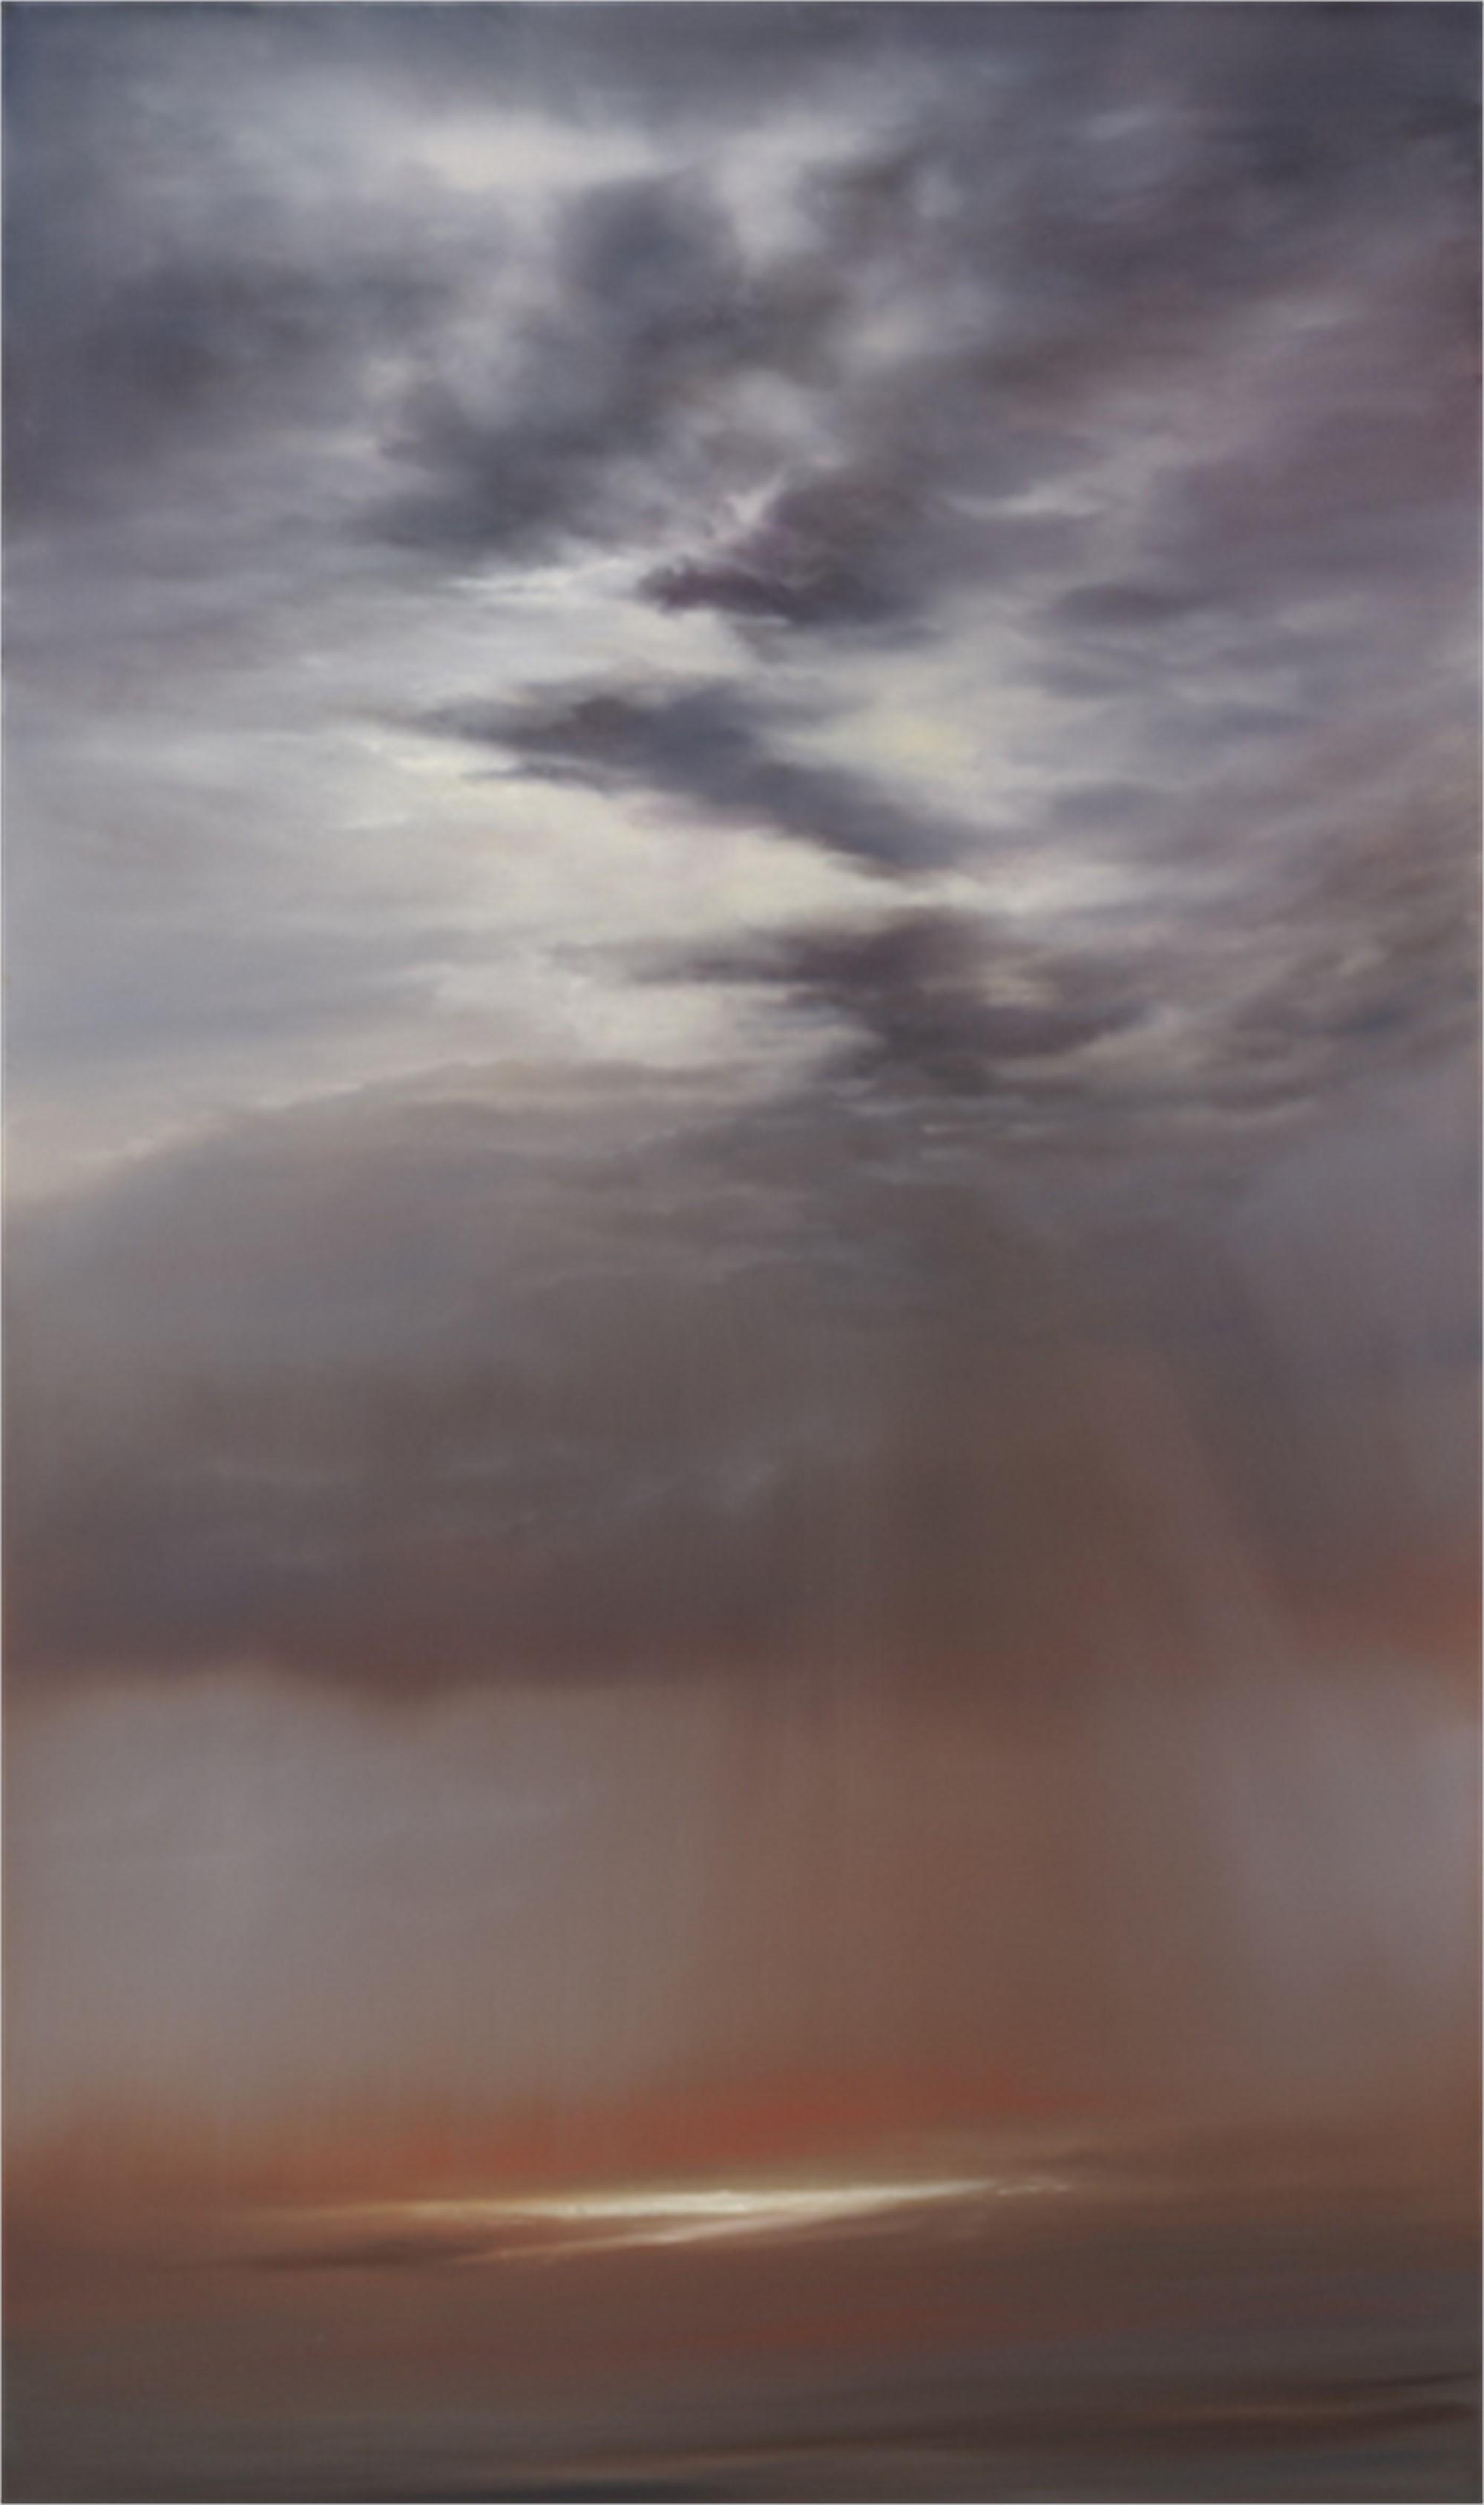 Whispering Heart (SN) by Cheryl Kline